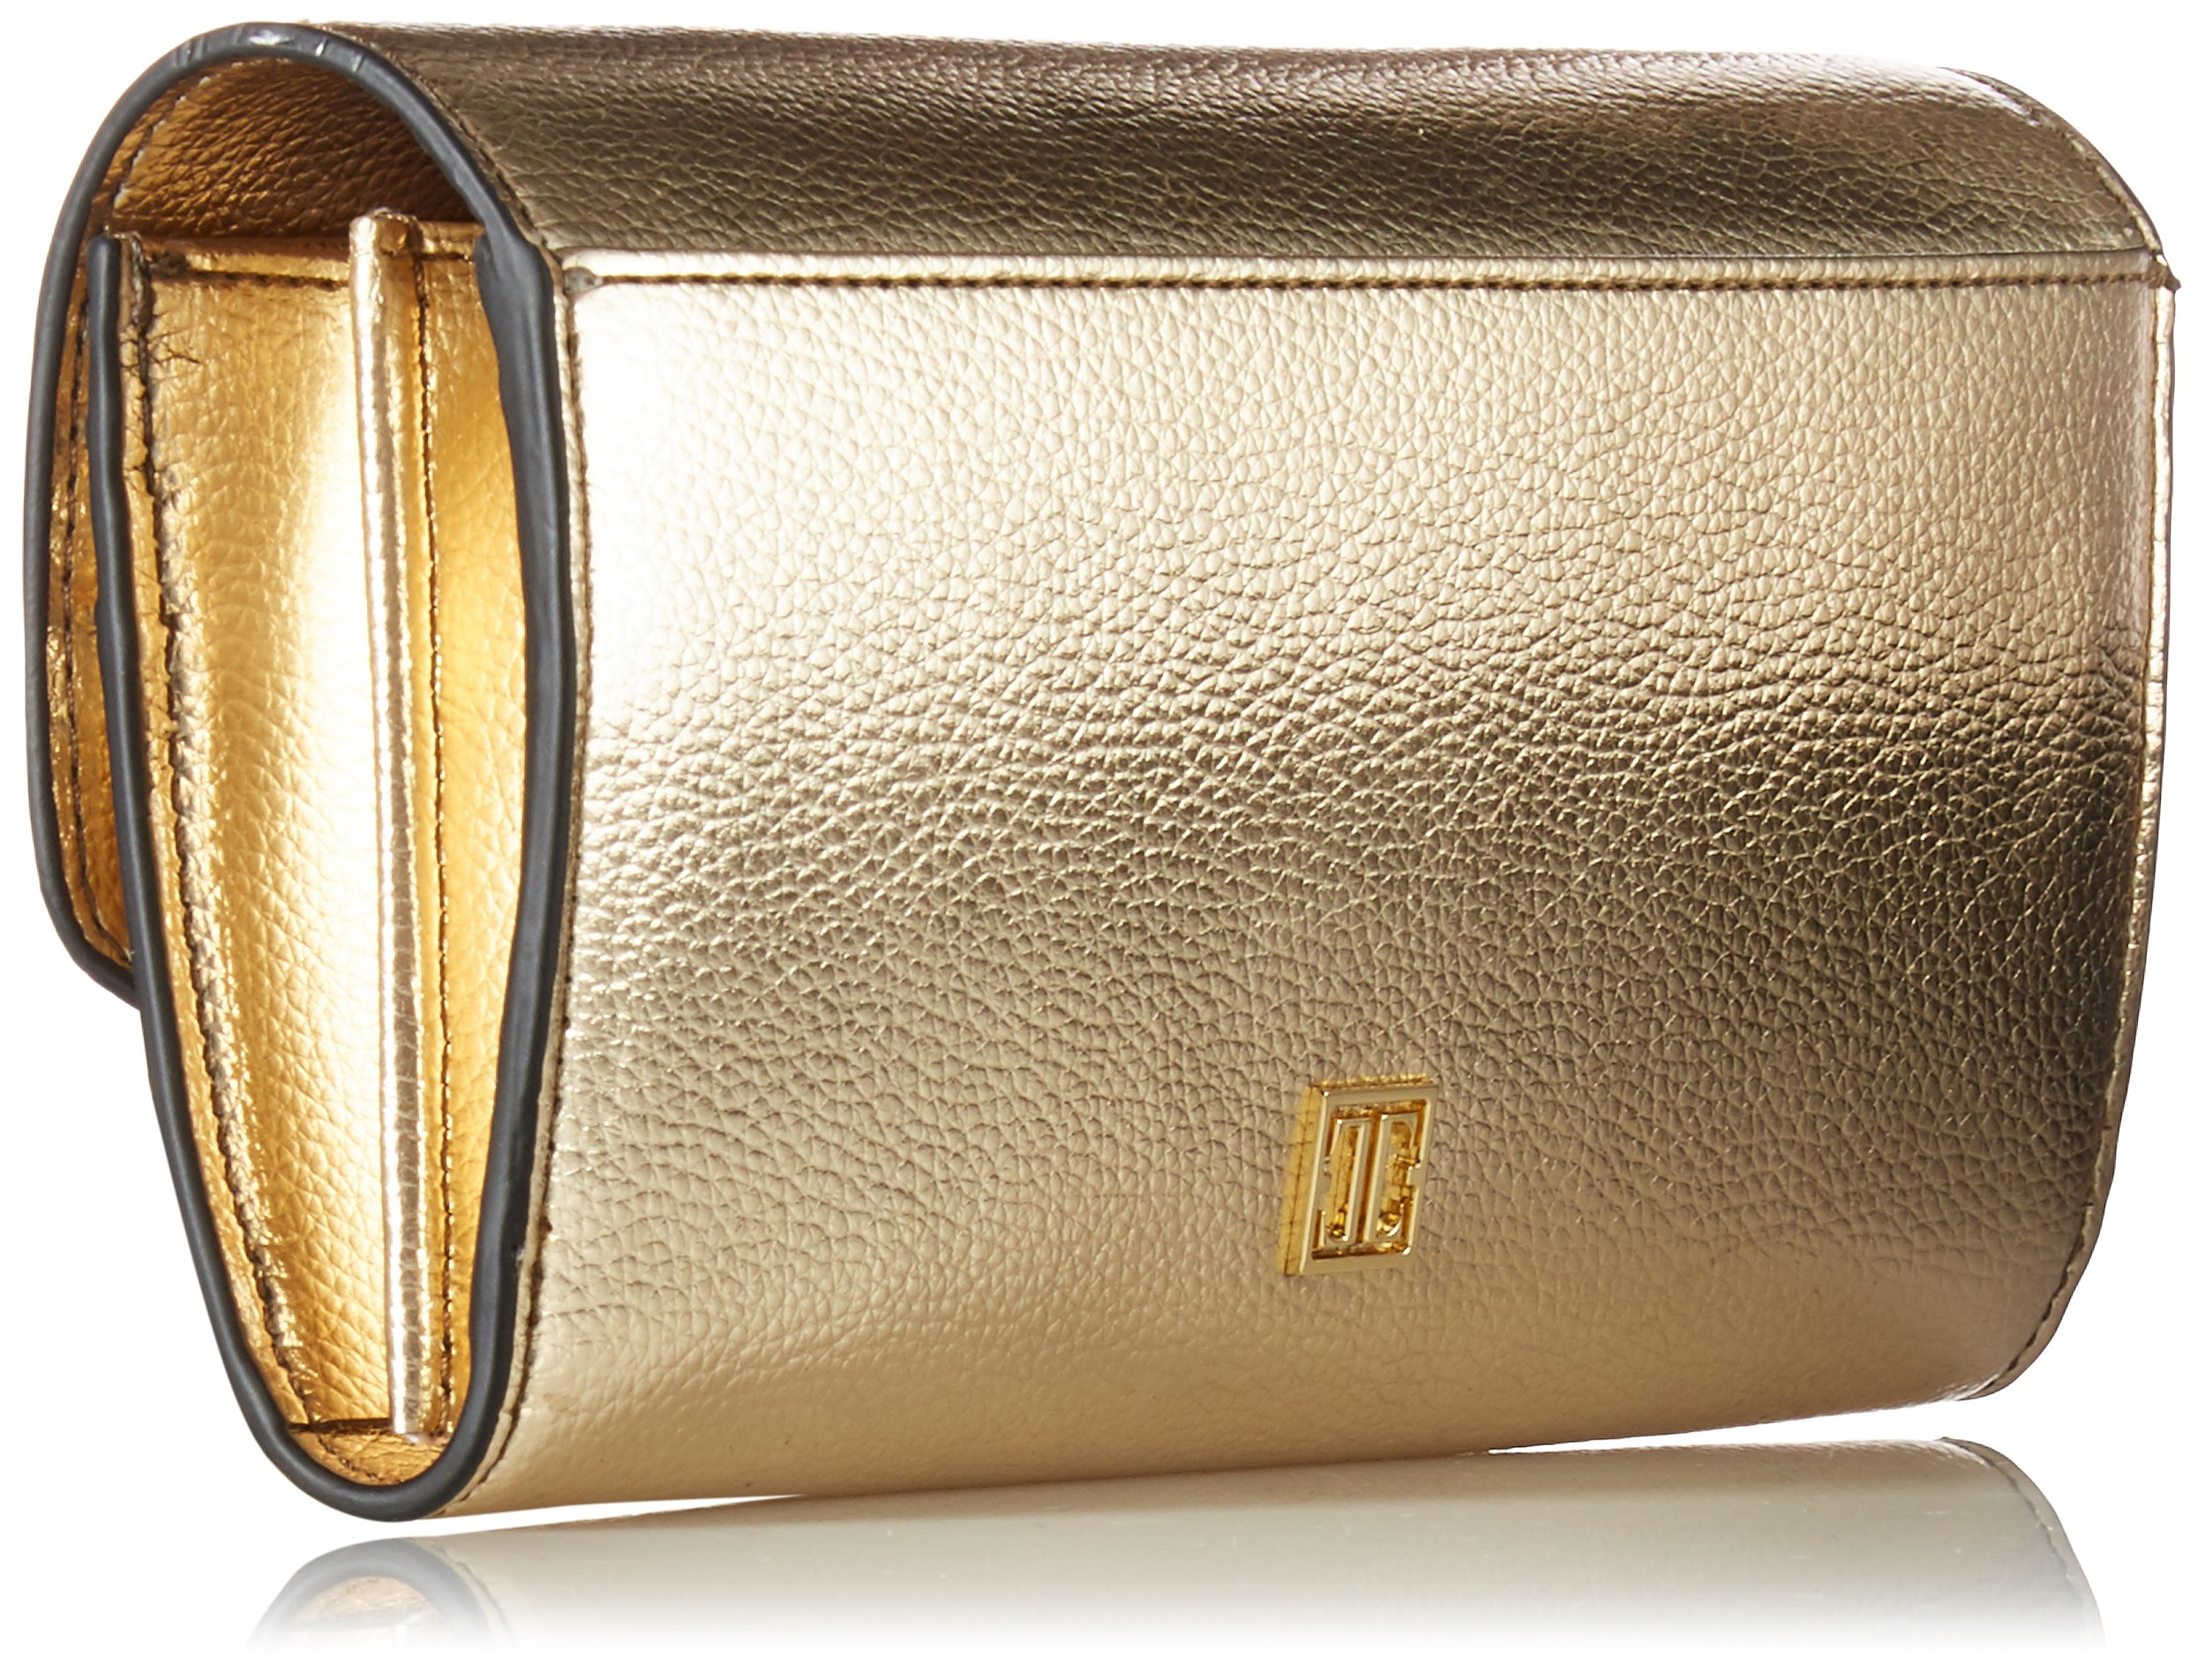 Ivanka Trump Mara Crossbody Wallet-Gold, Metallic Pebble by Ivanka Trump (Image #2)